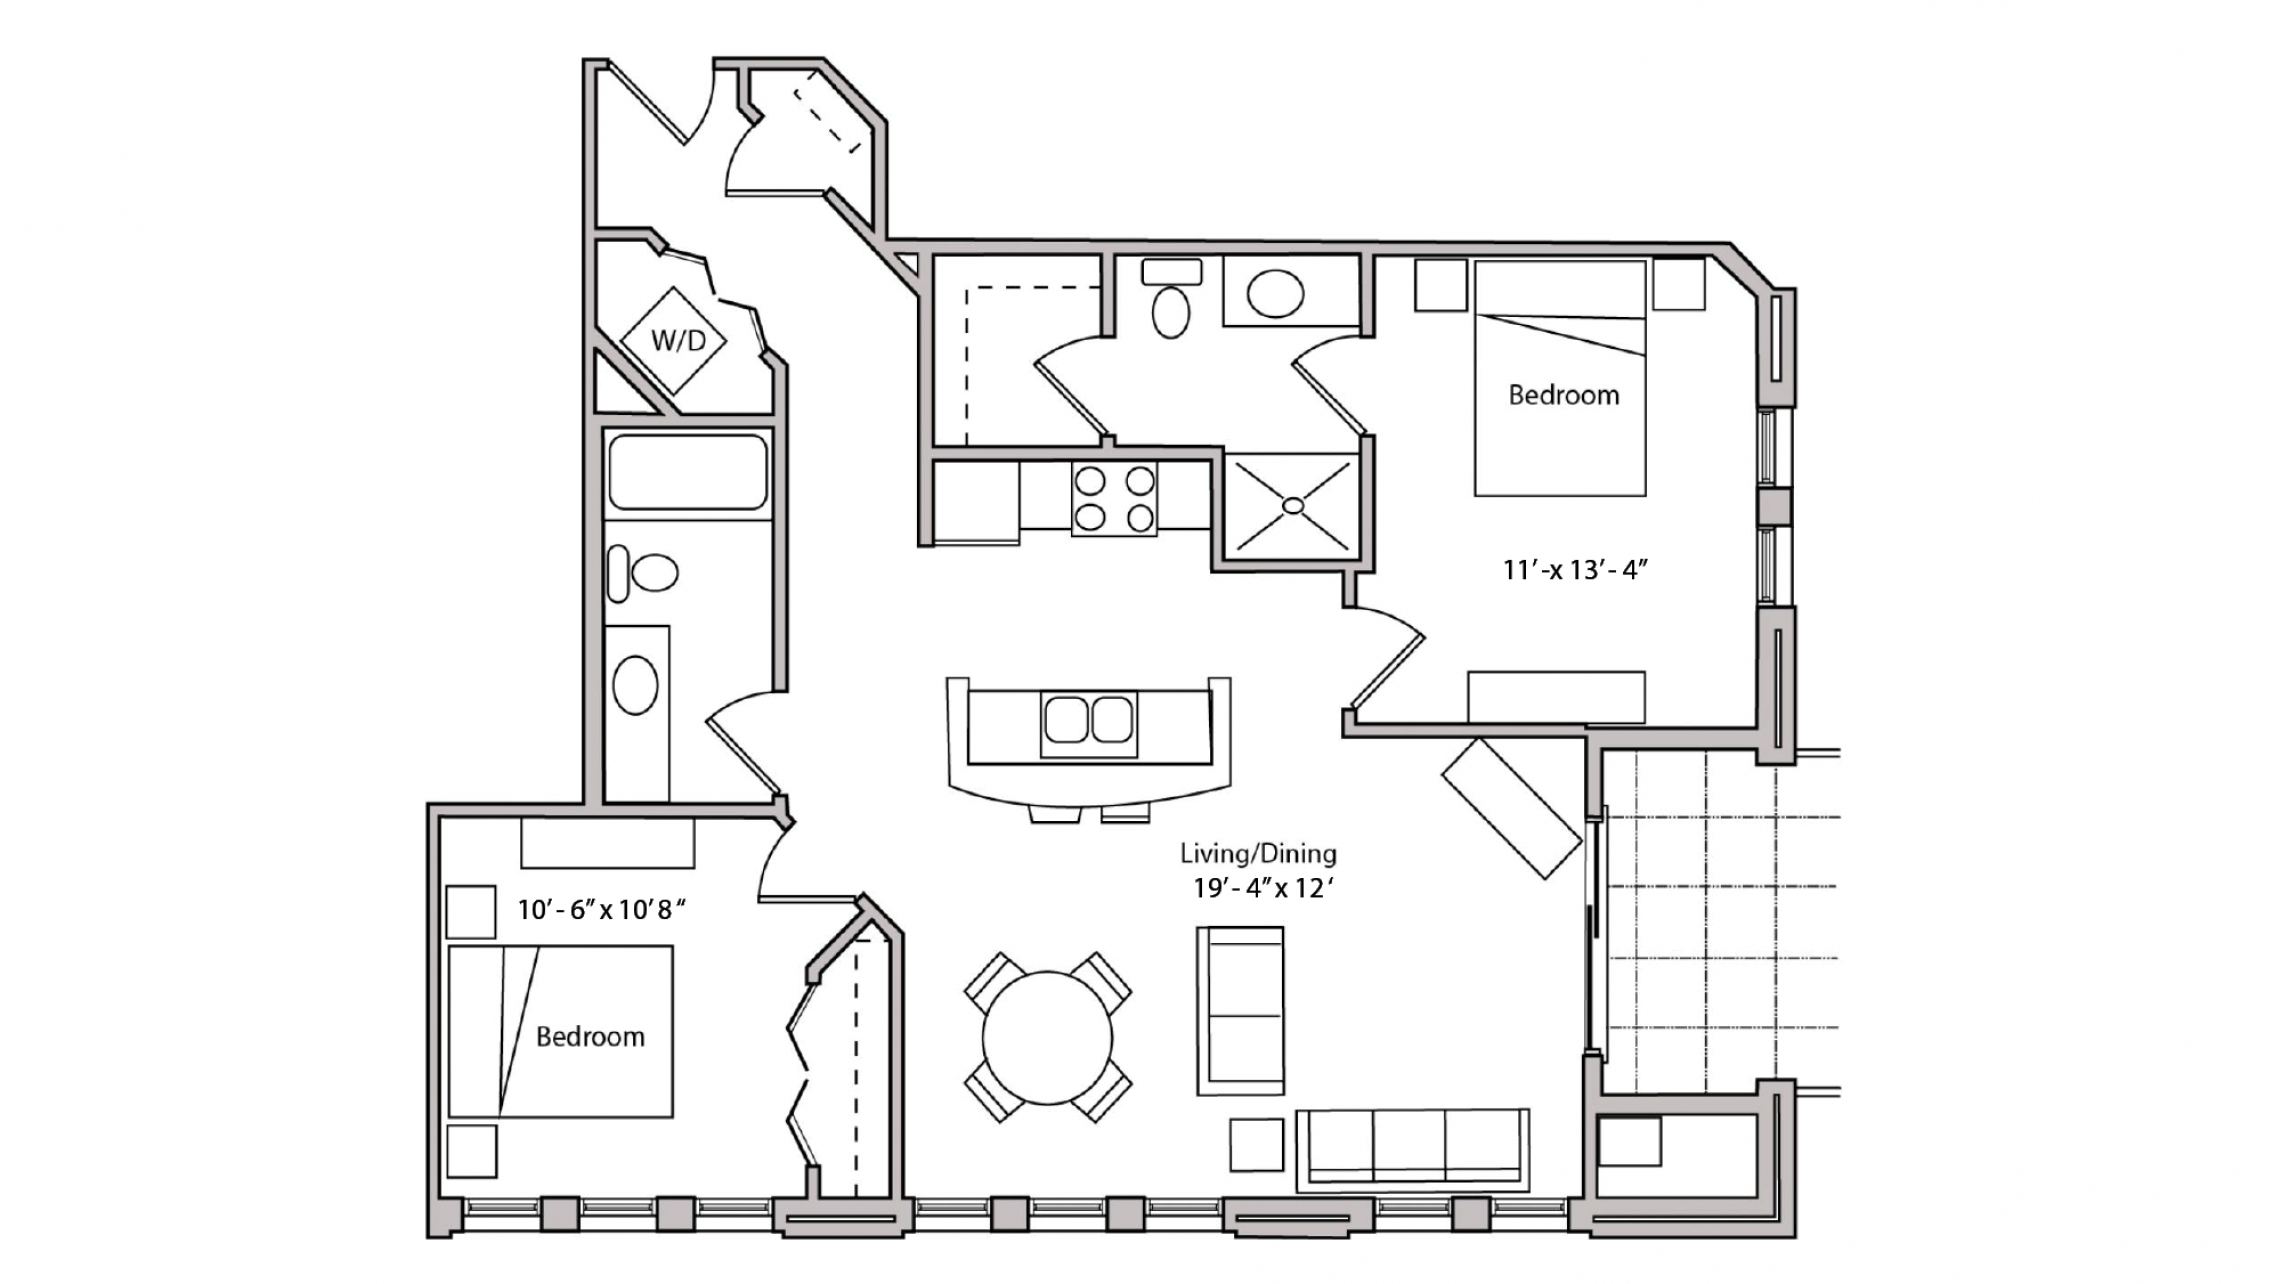 ULI The Depot 1-504 - Two Bedroom, Two Bathroom